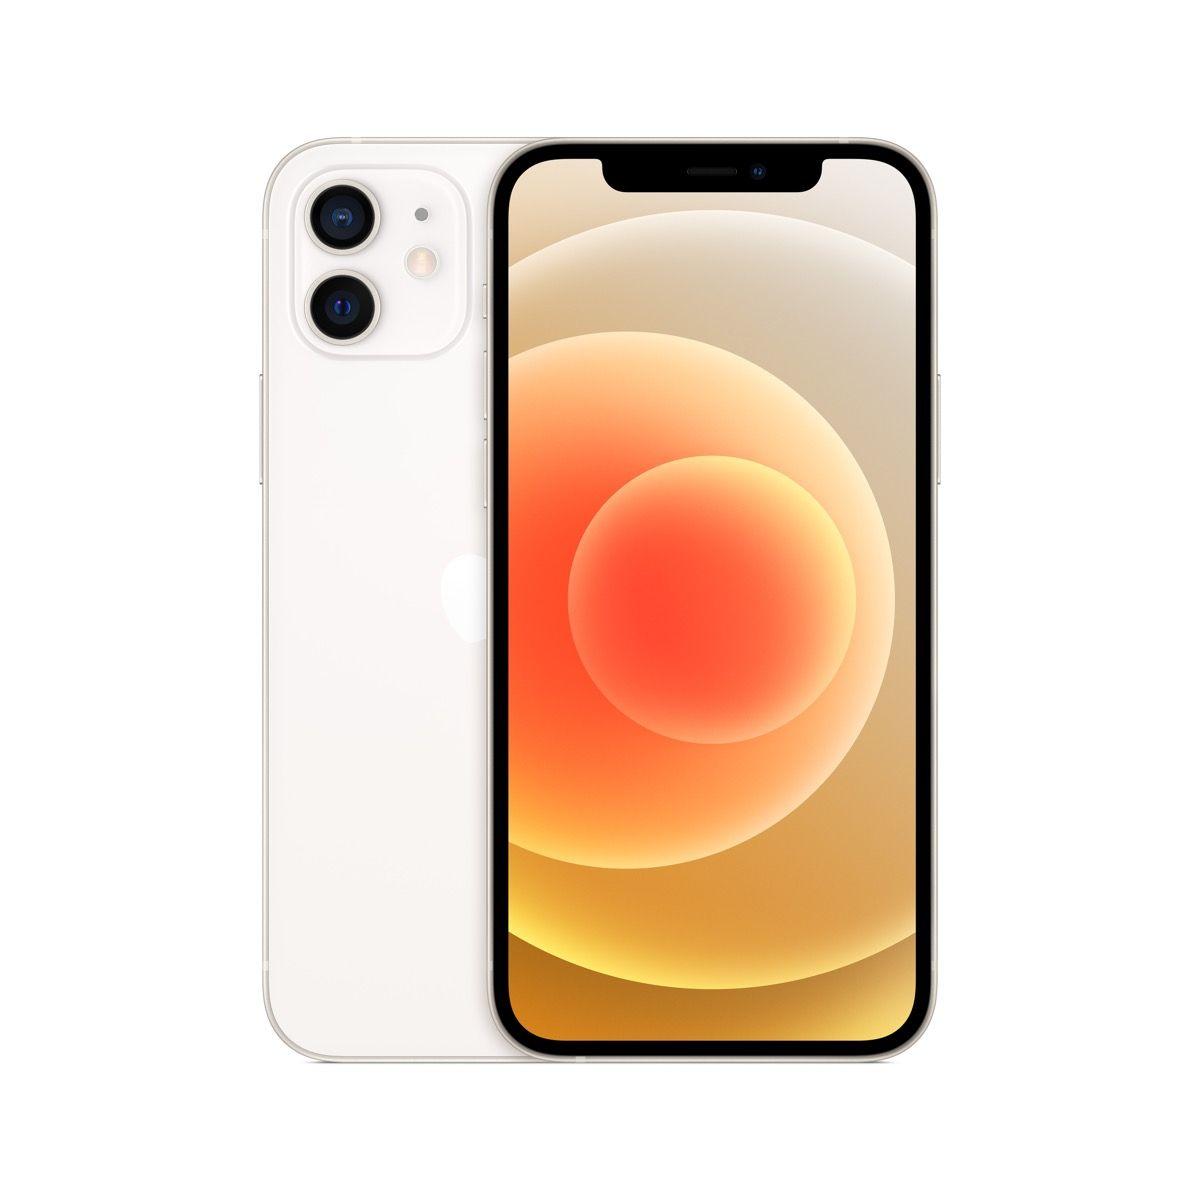 Apple iPhone 12 128GB White / SK